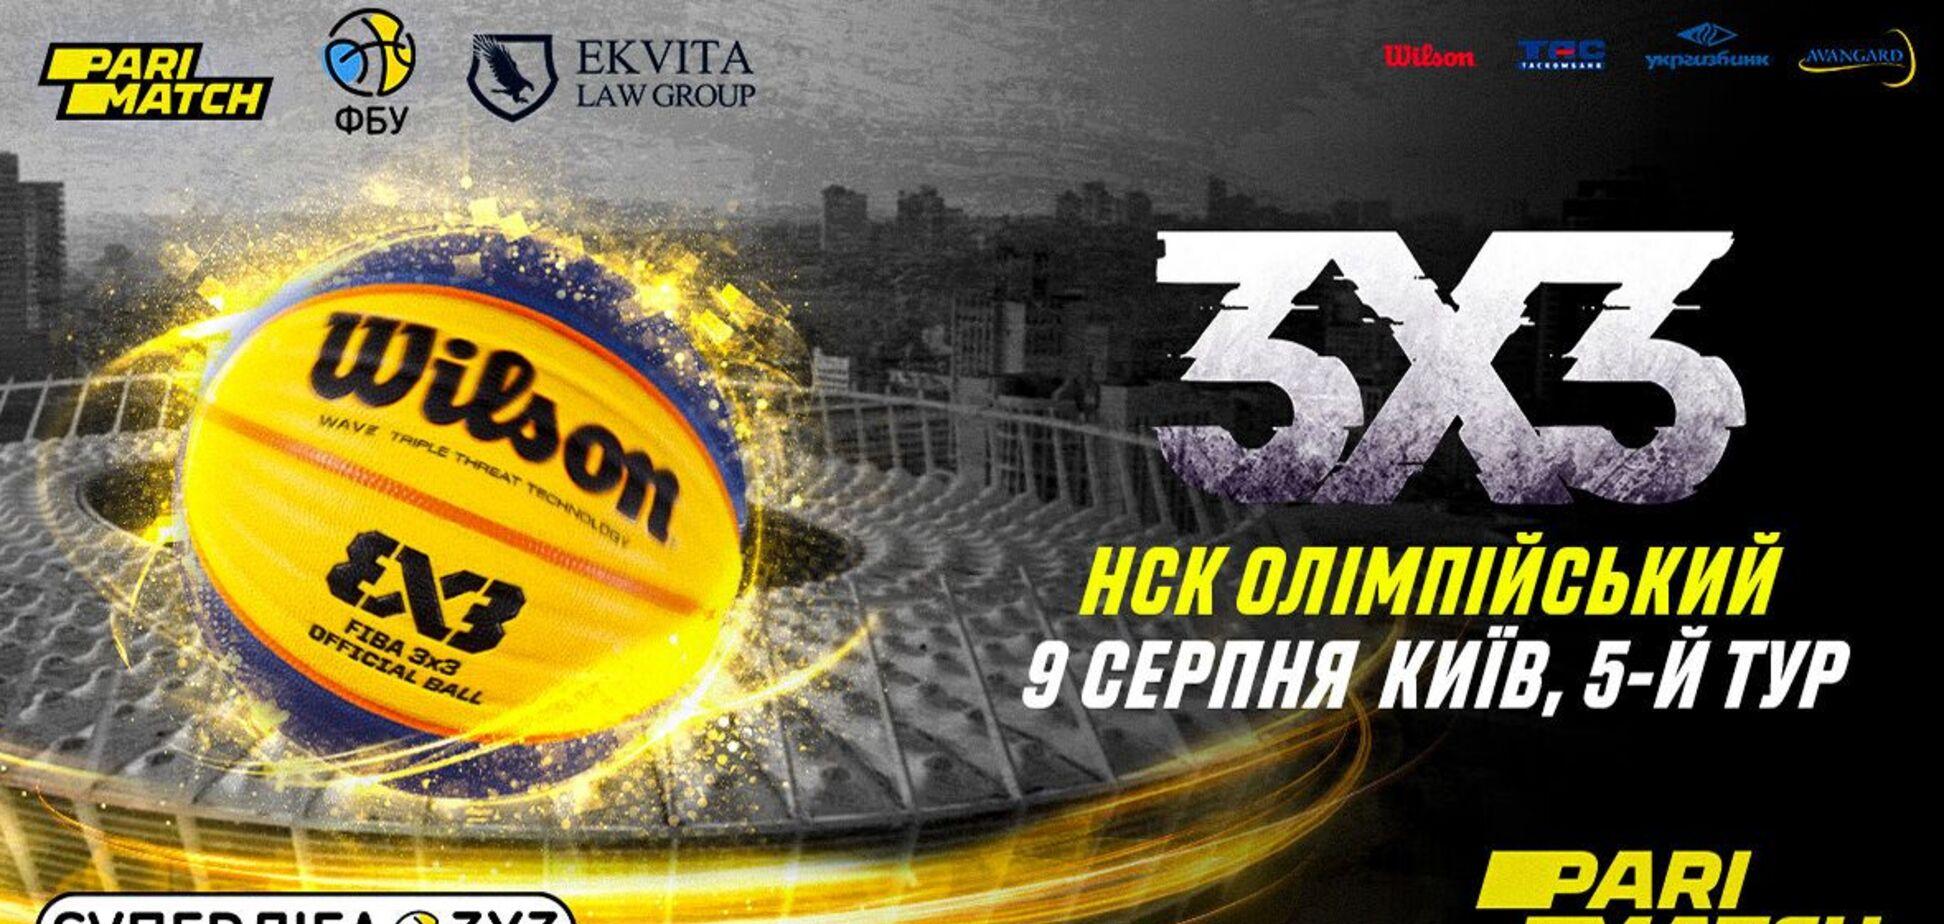 Определились участники пятого тура Суперлиги Пари-Матч по баскетболу 3х3